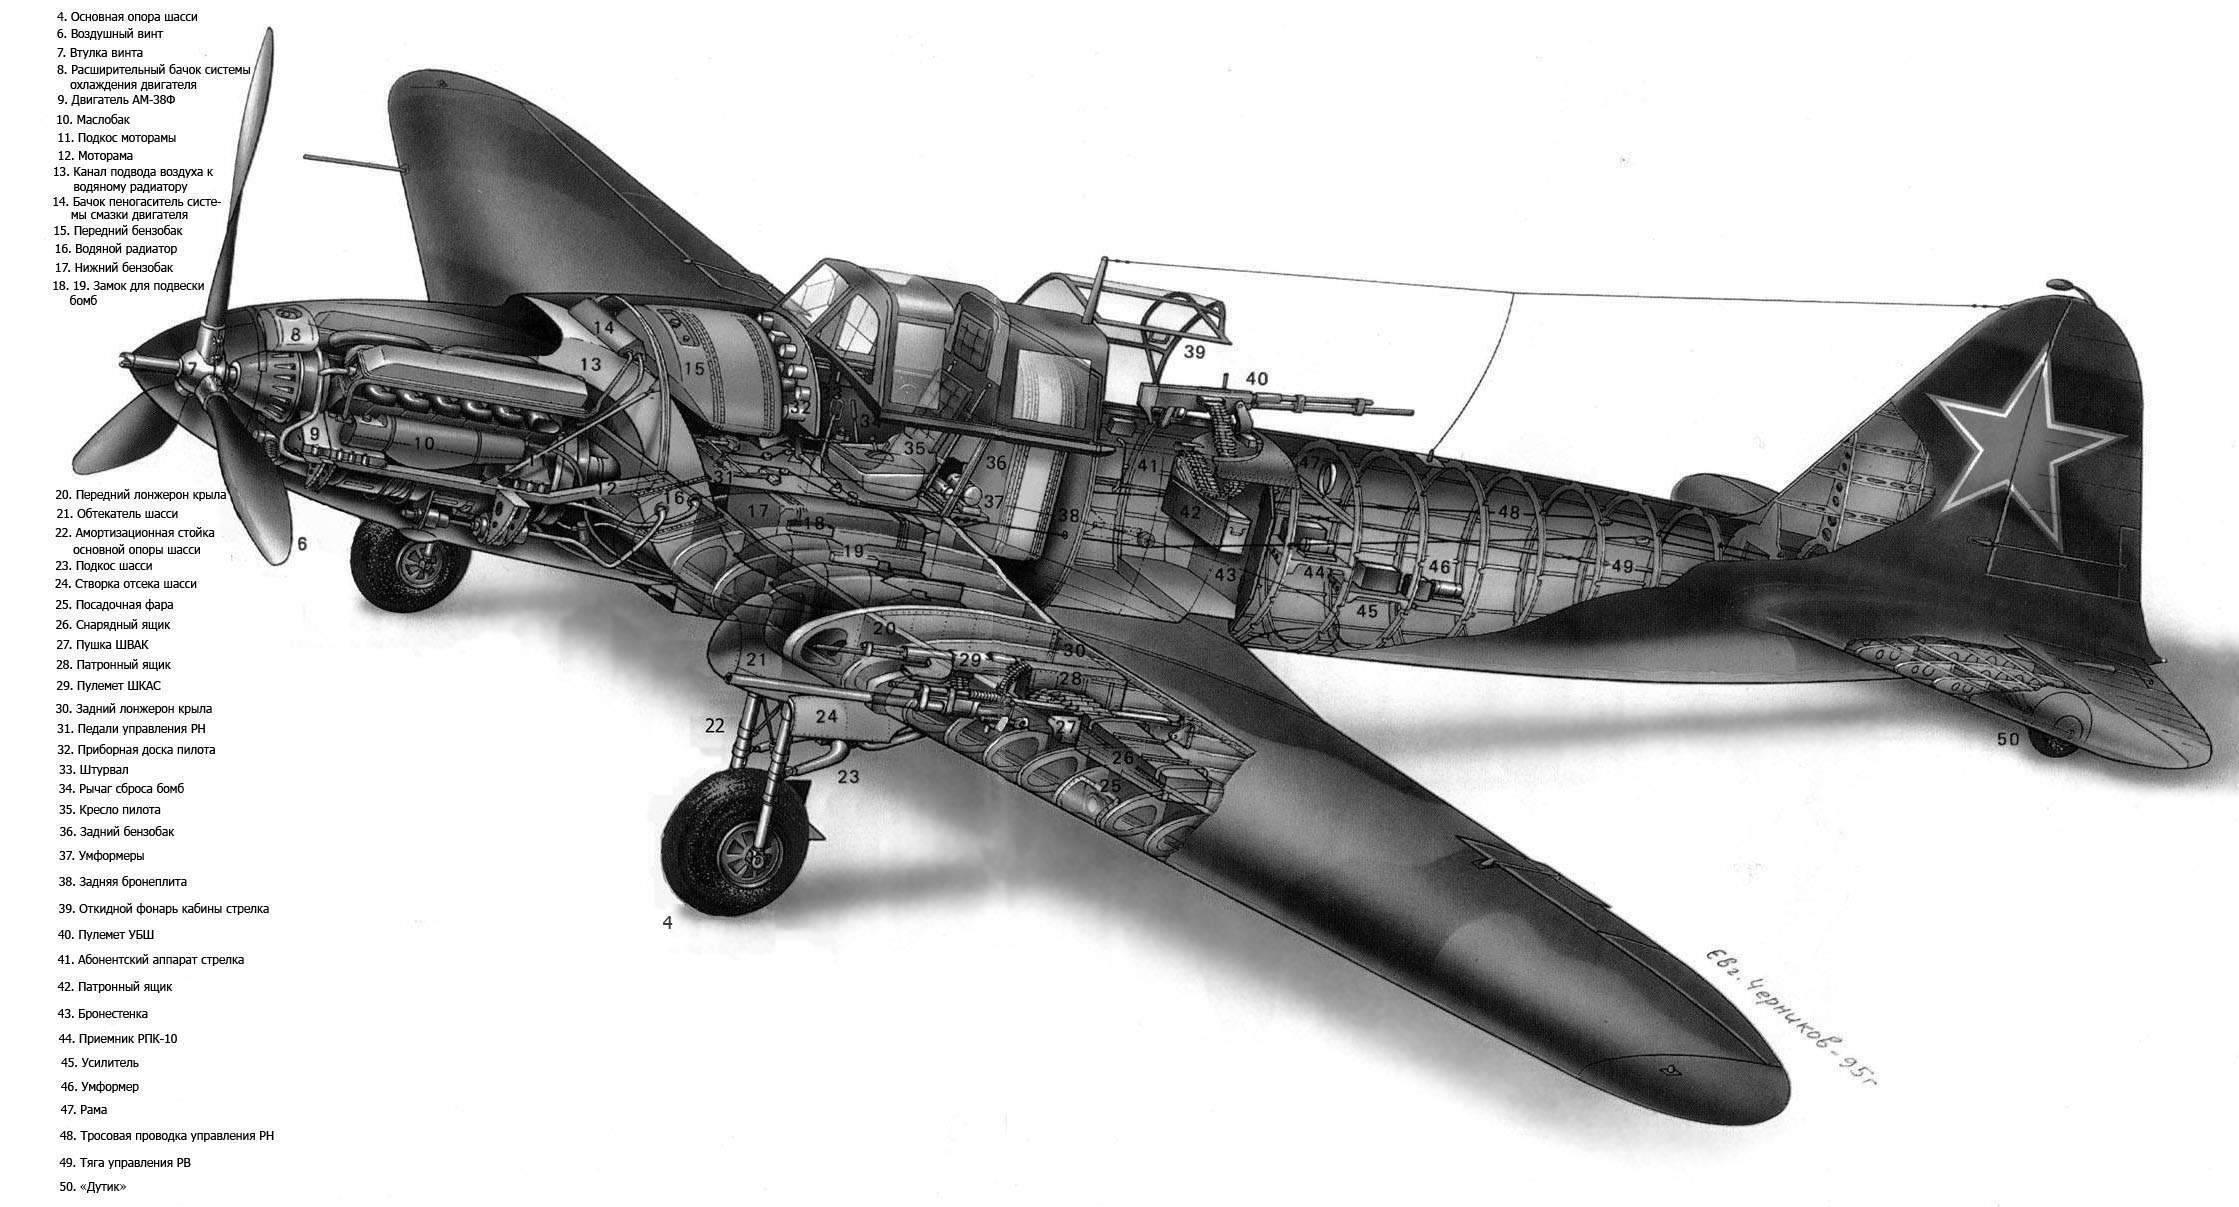 Штурмовик ил-10 (ссср)